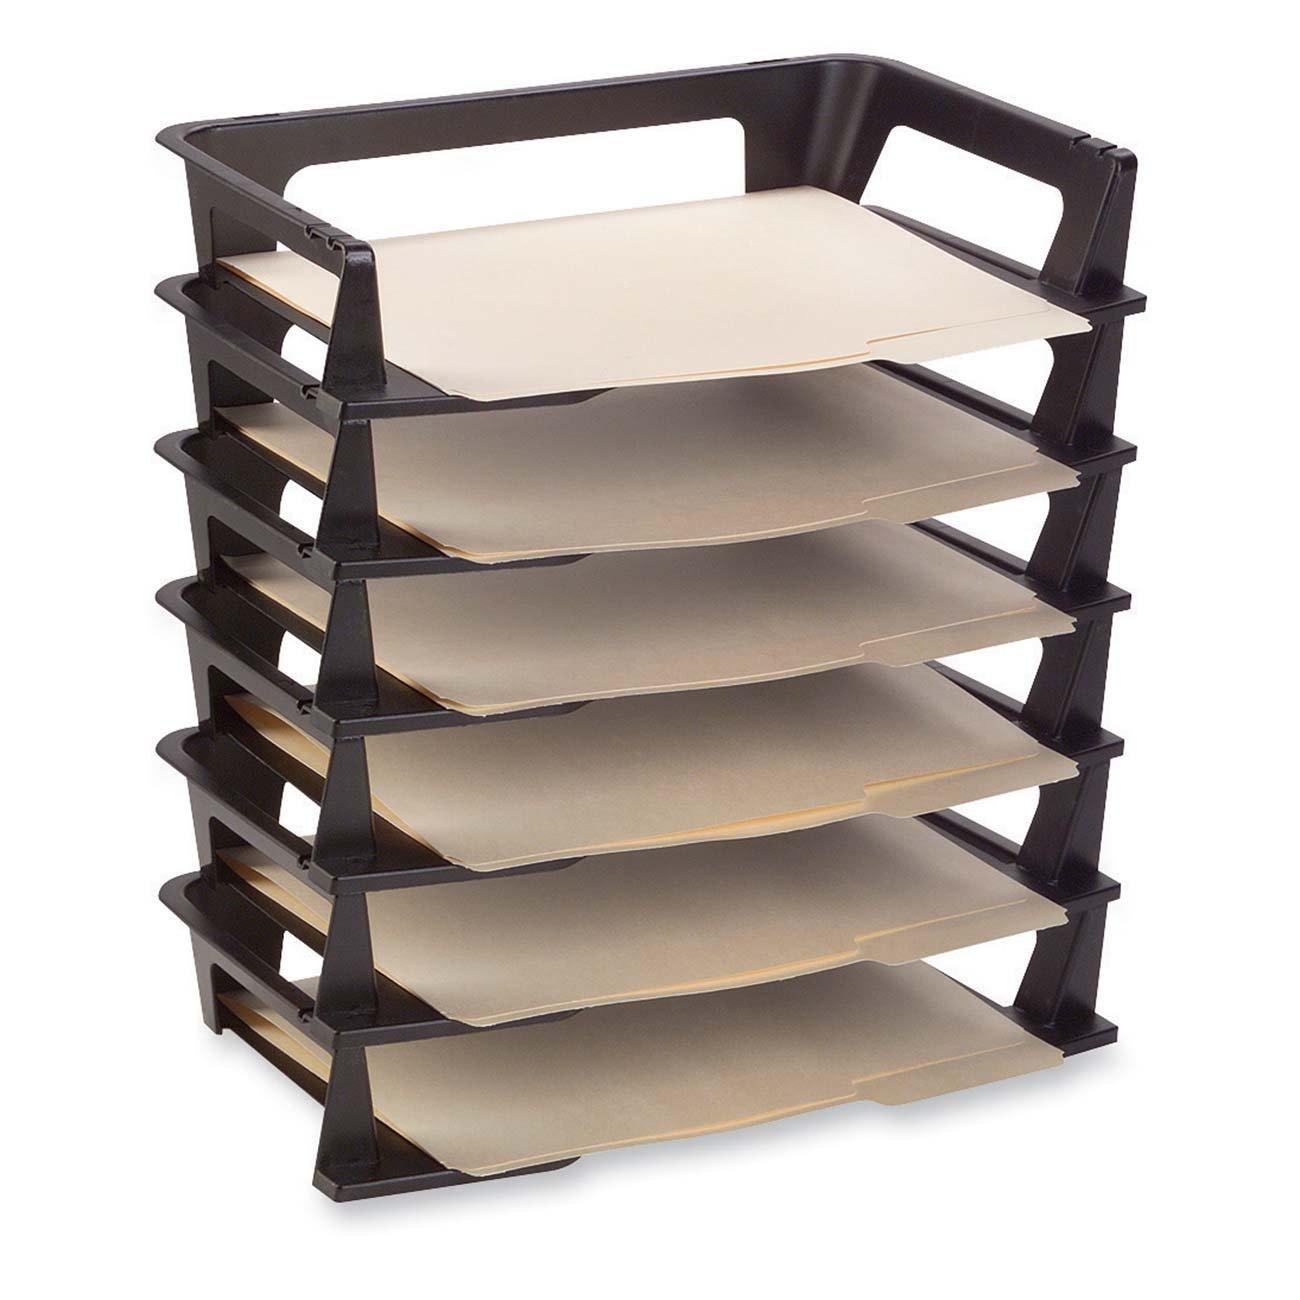 plastic letter a4 office tray 6 pack stackable shelf. Black Bedroom Furniture Sets. Home Design Ideas